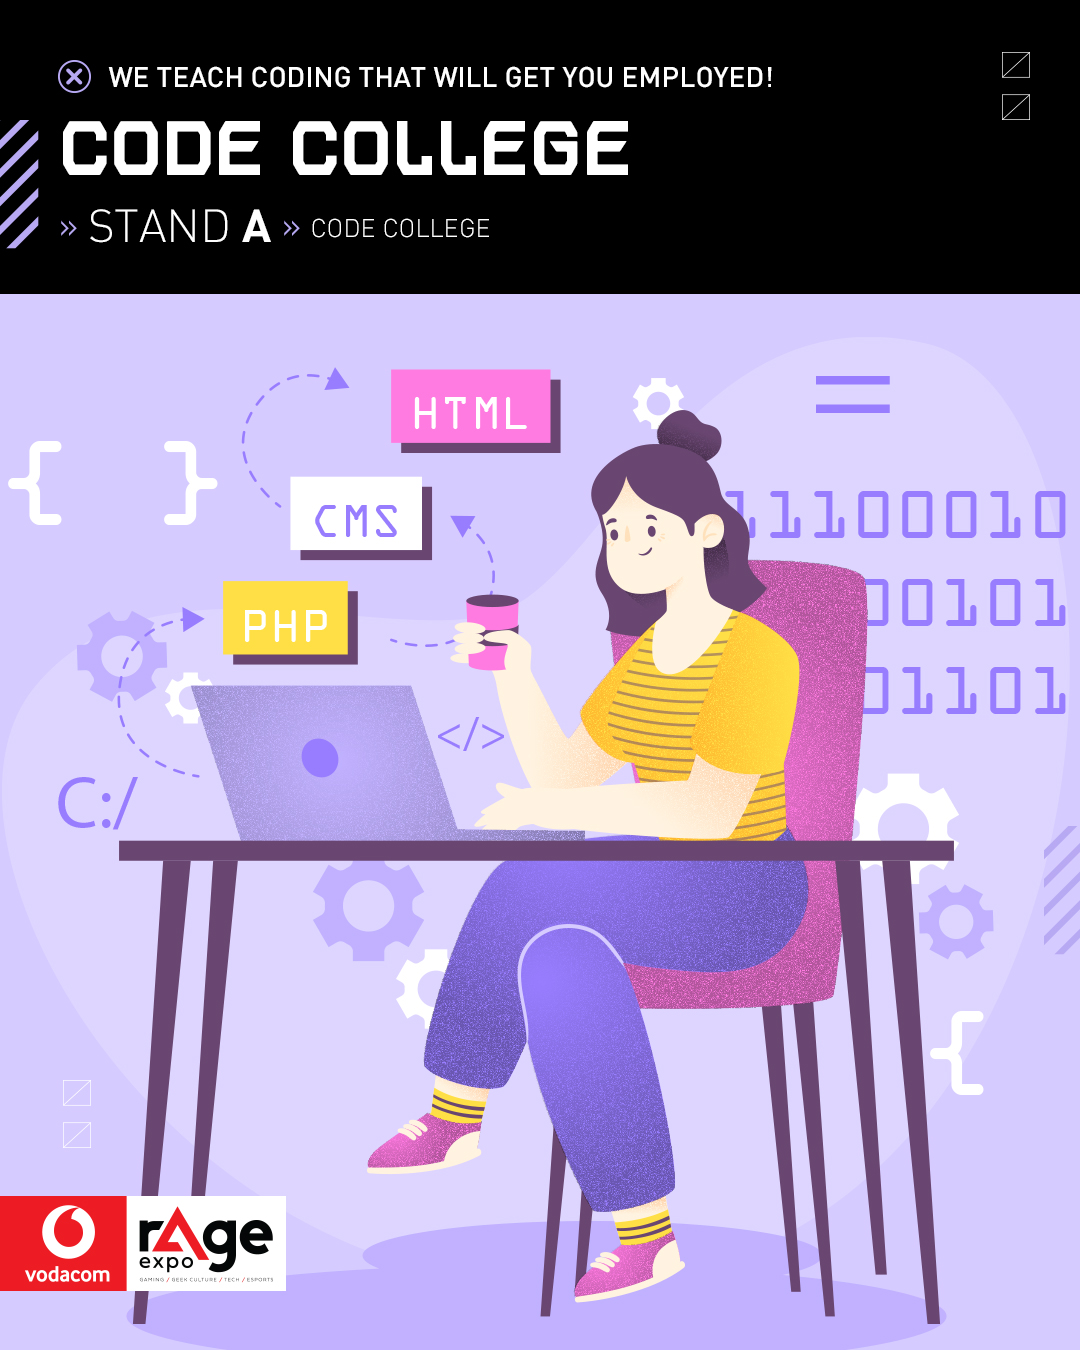 Vodacom rAge 2019 - Code College